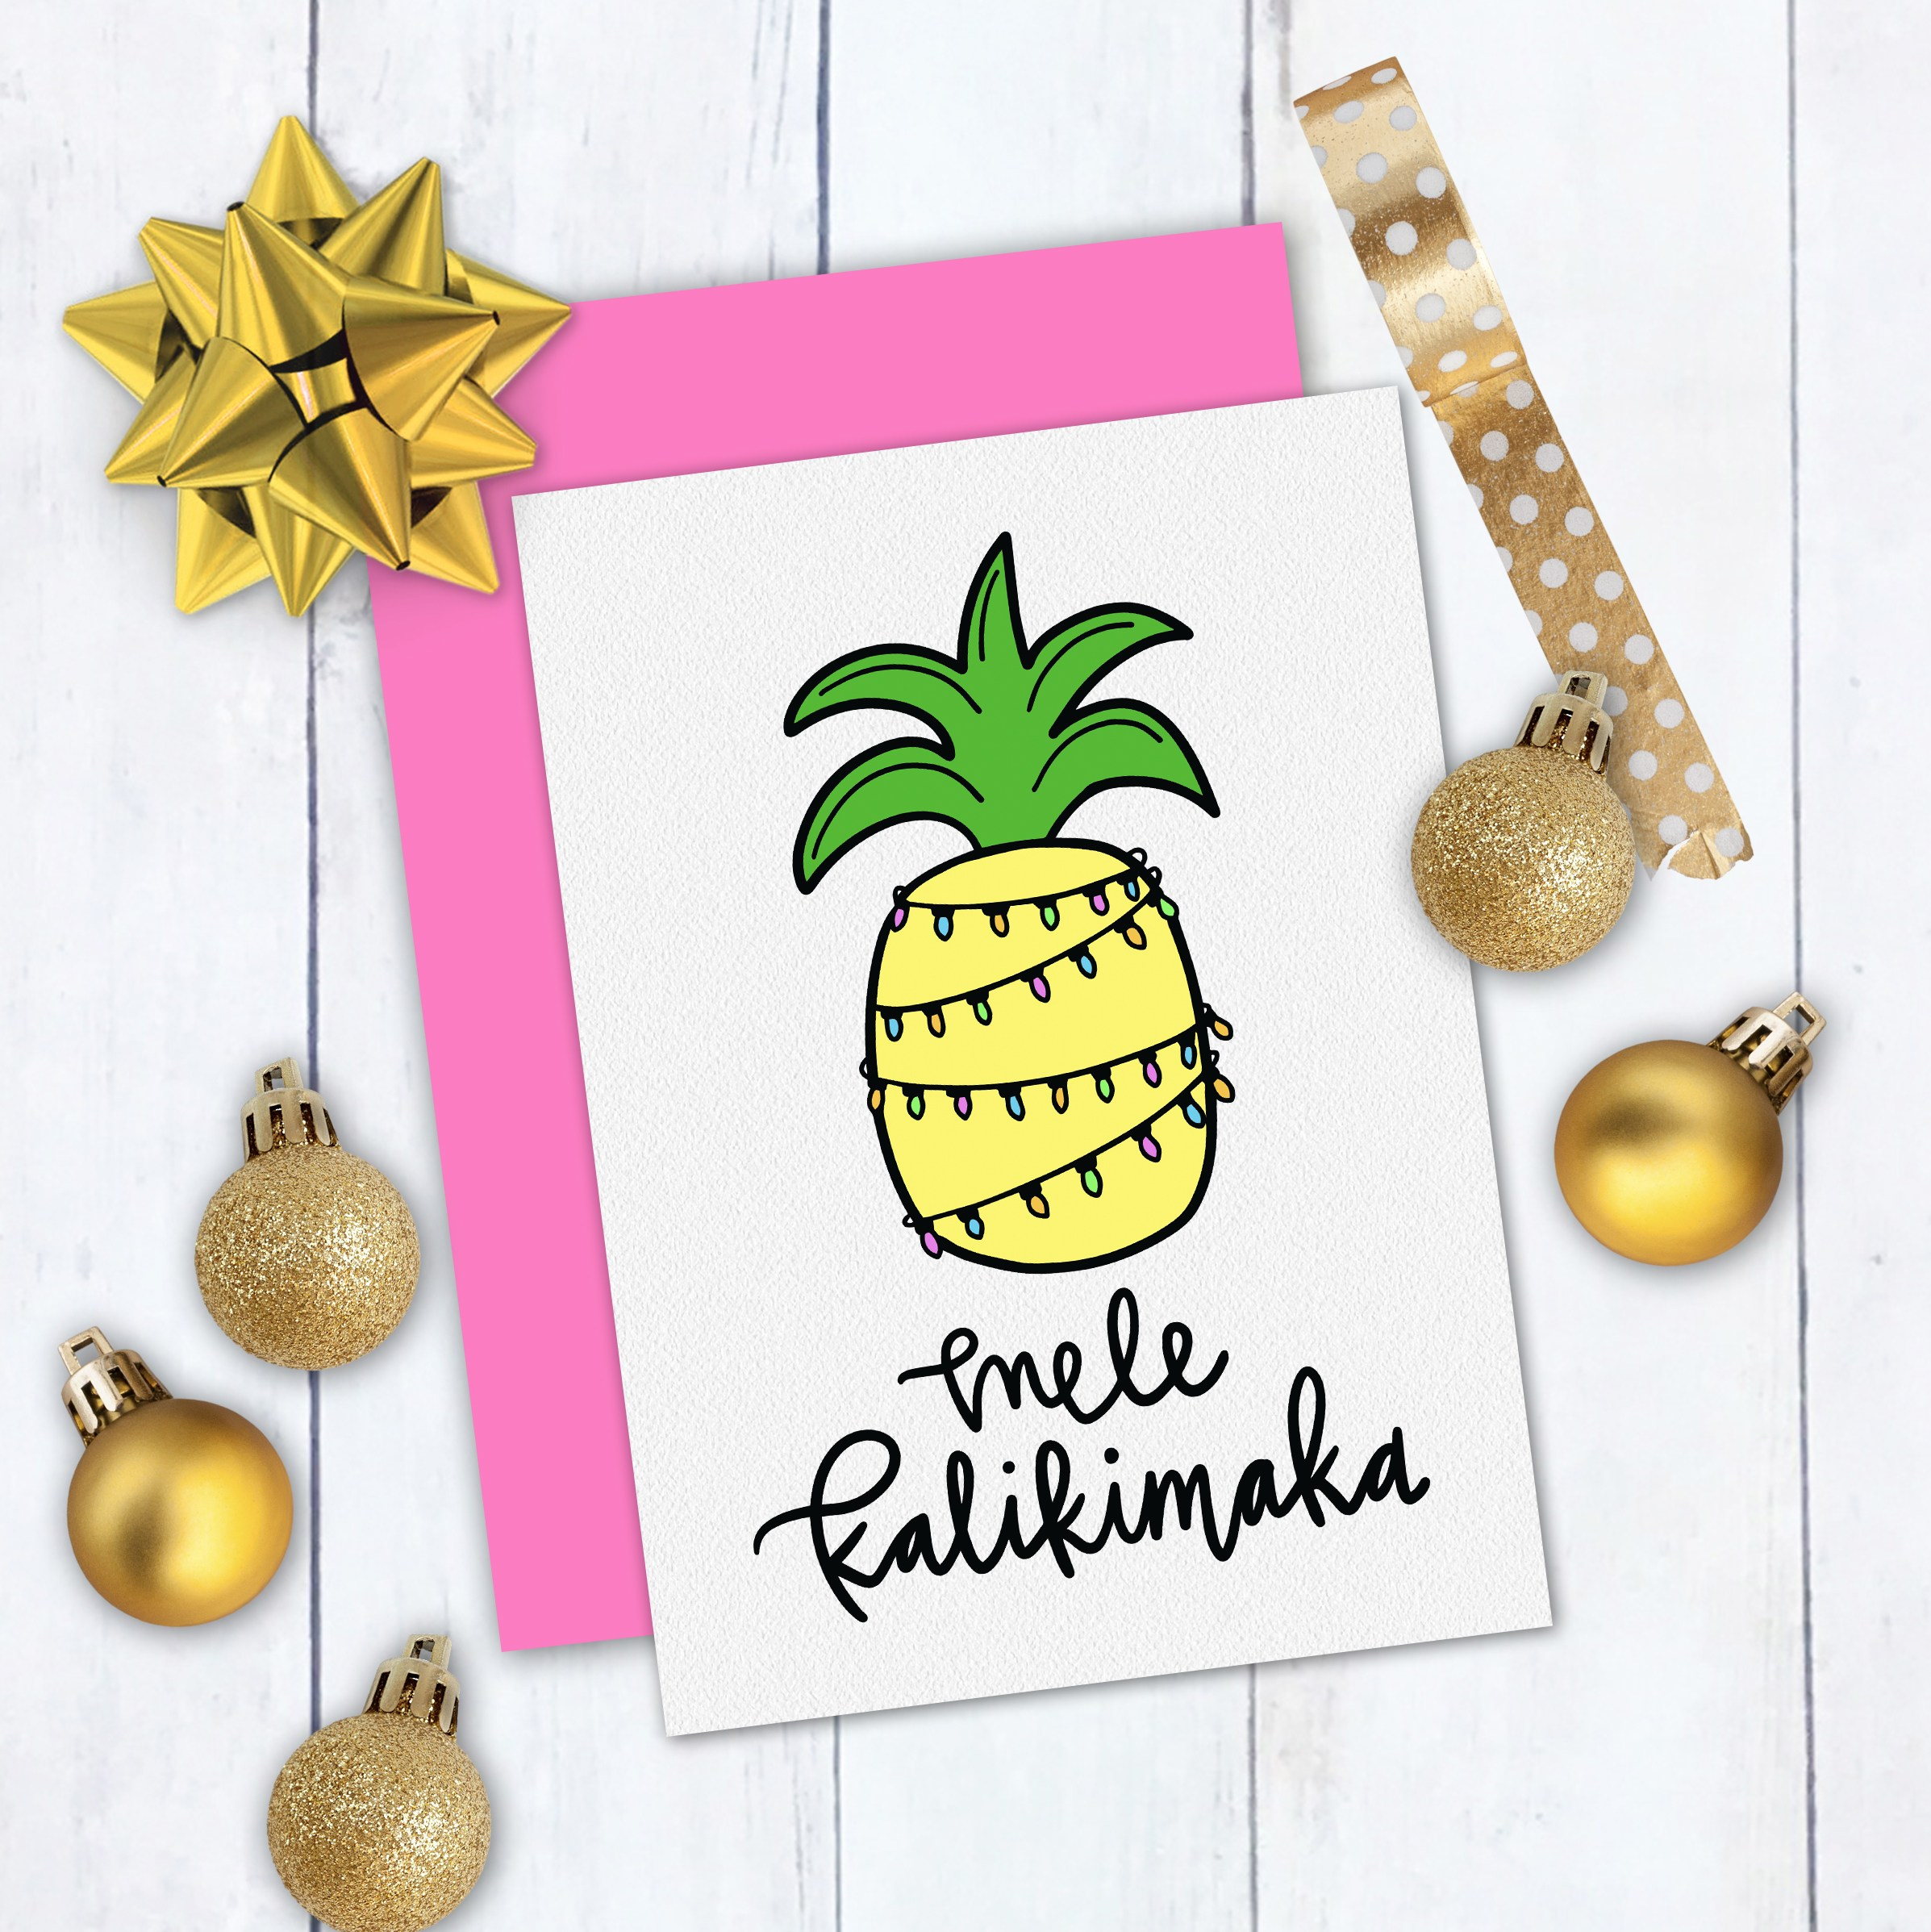 Mele Kalikimaka Free Tropical Christmas SVG.